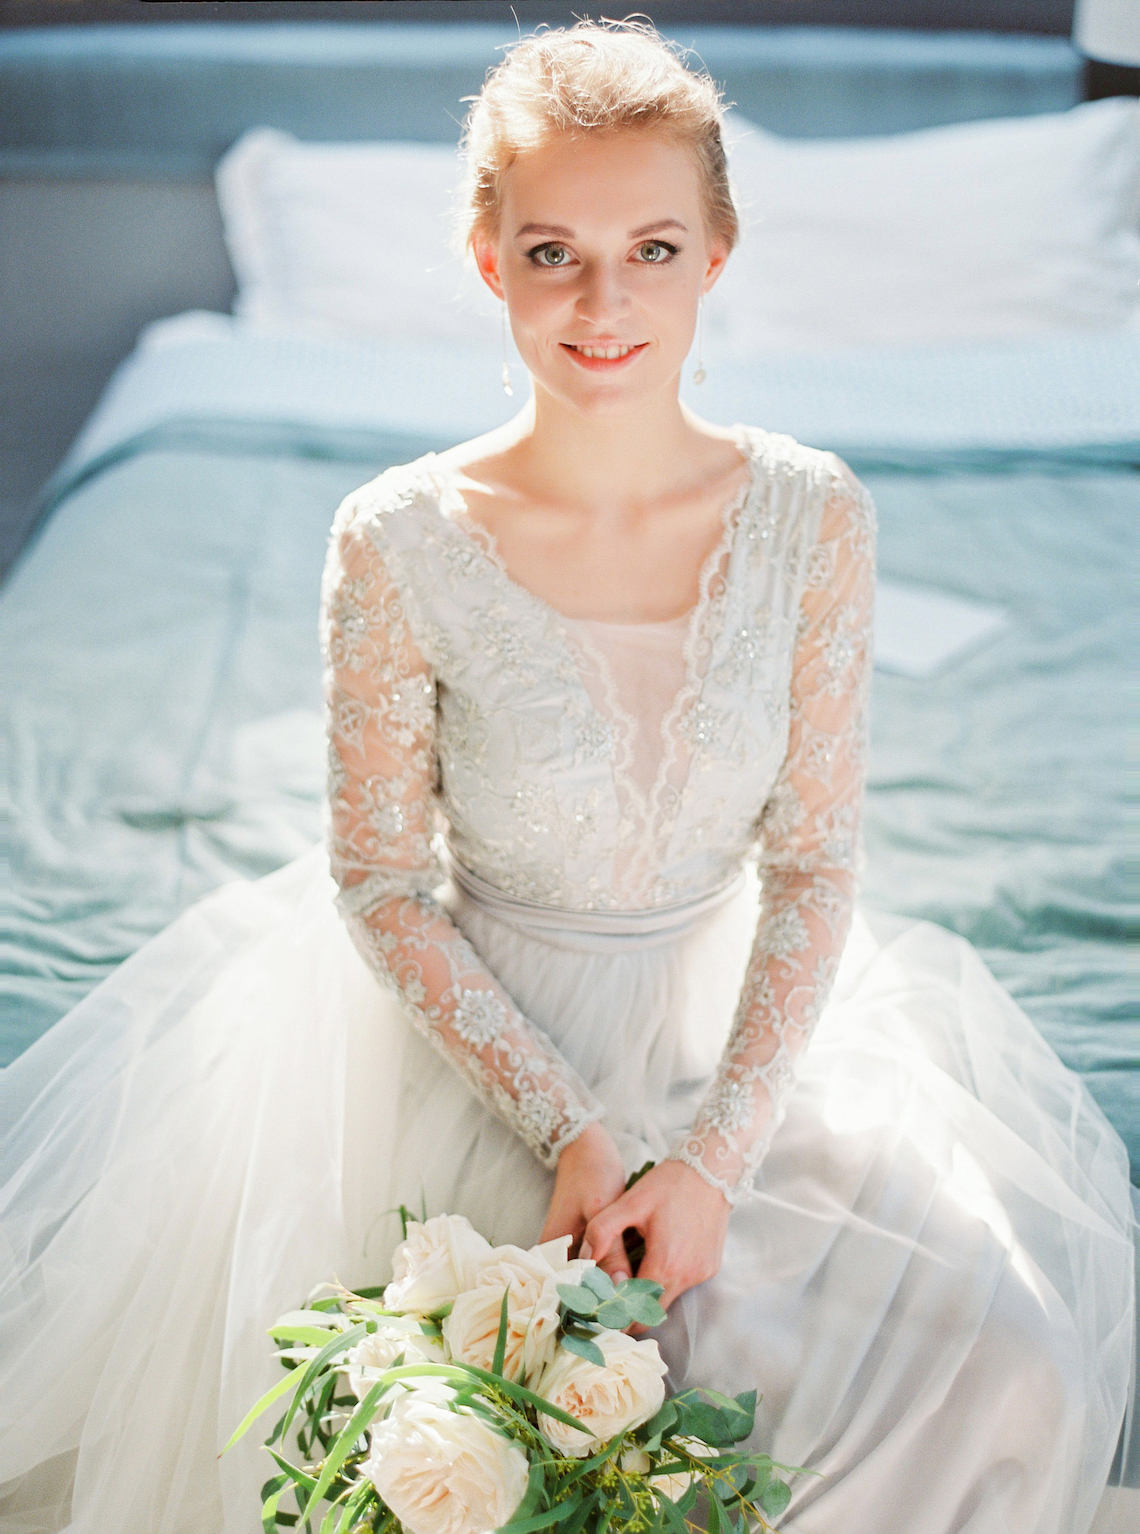 Romantic wedding dresses for the bride who wants subtle ...